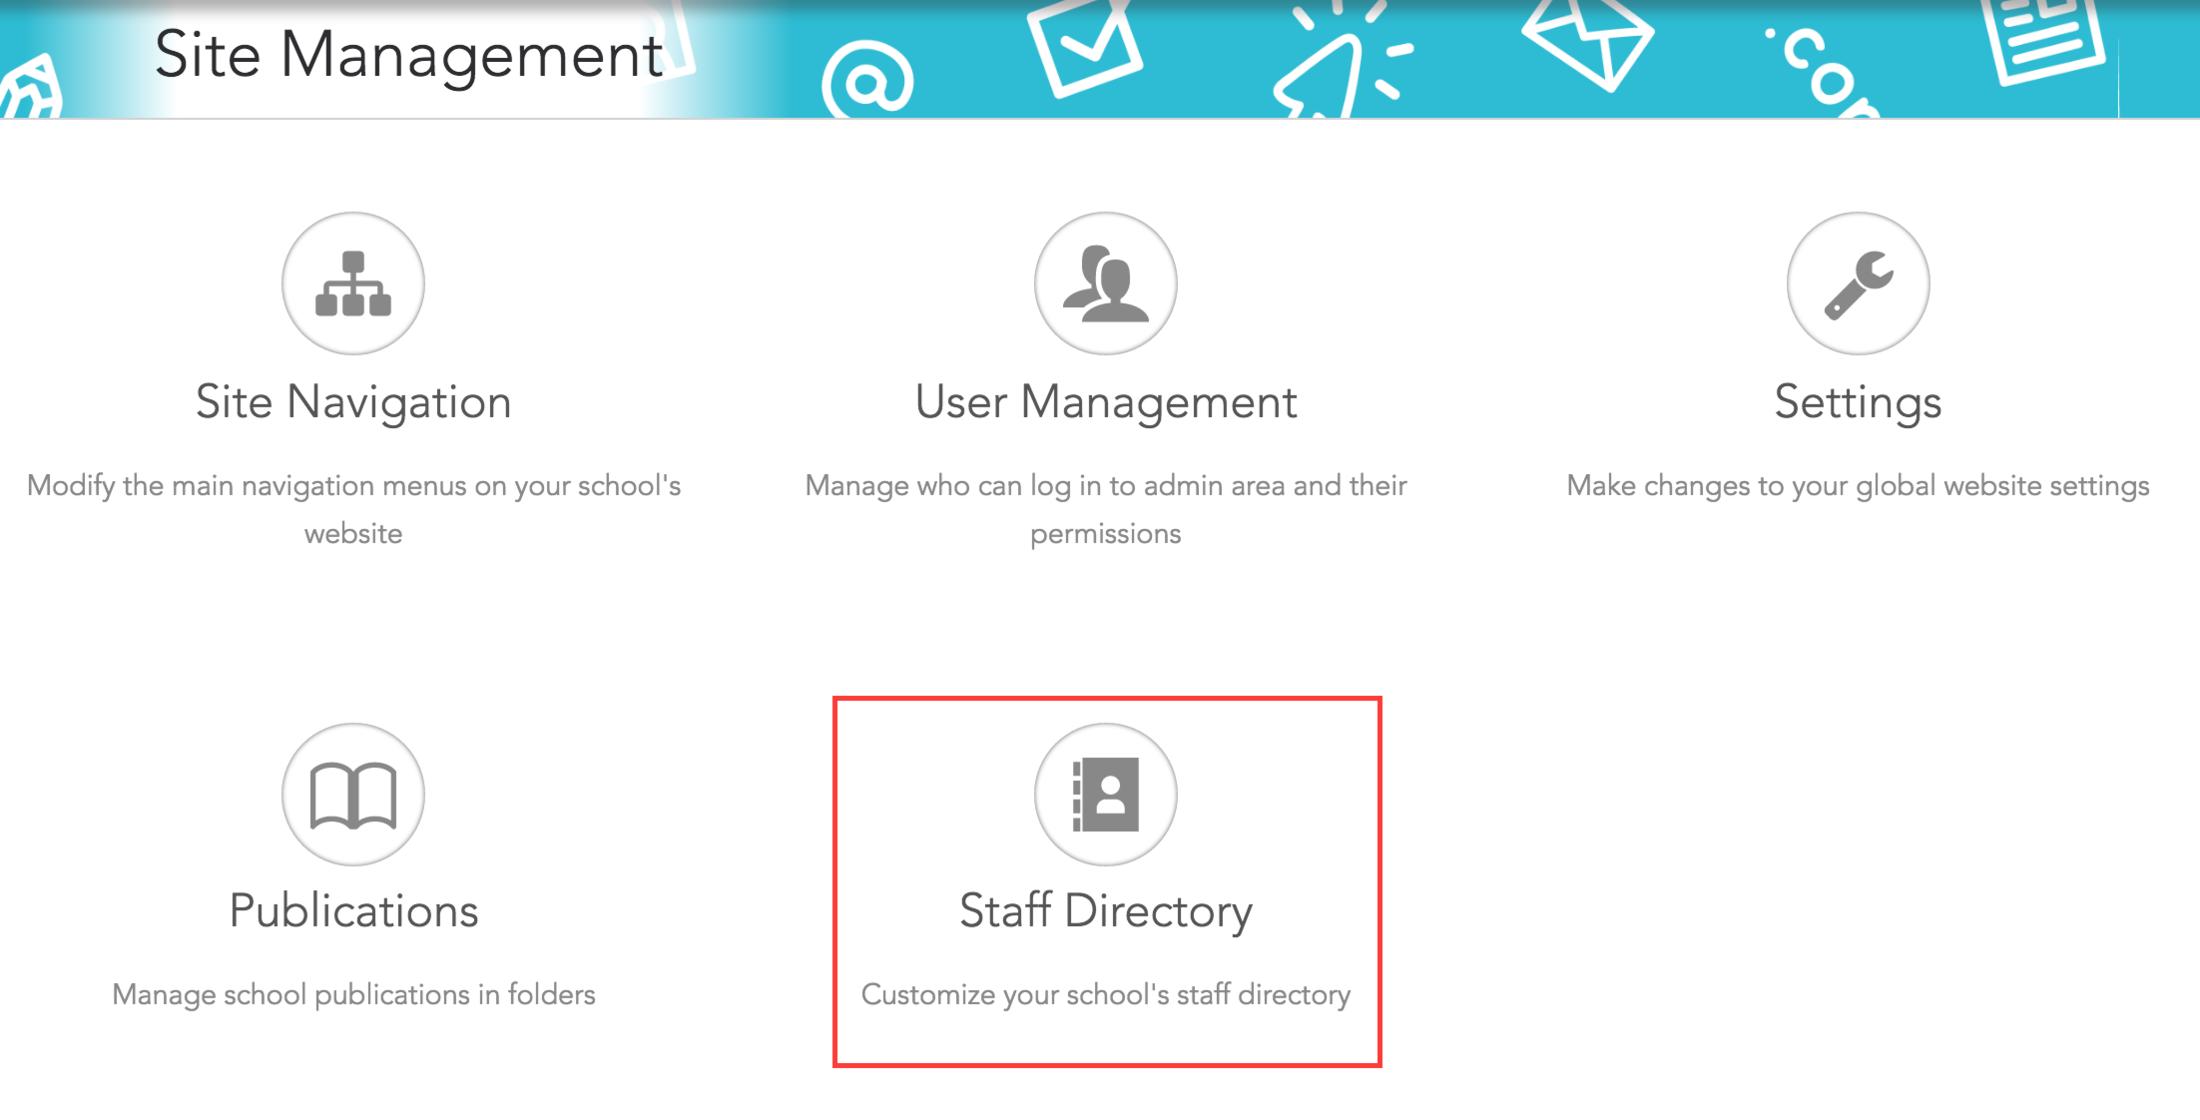 Click Staff Directory